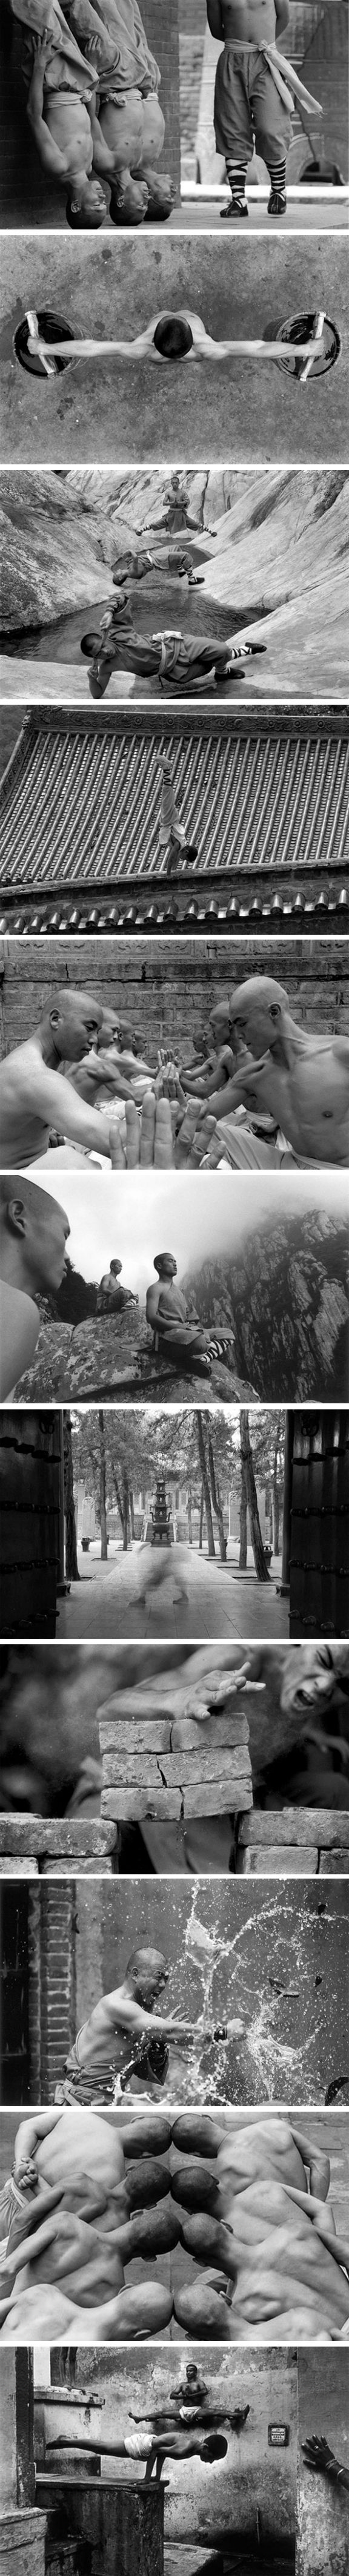 ♂ Chinese martial art Shaolin Kungfu Black & white photo from http://gudzowaty.com/